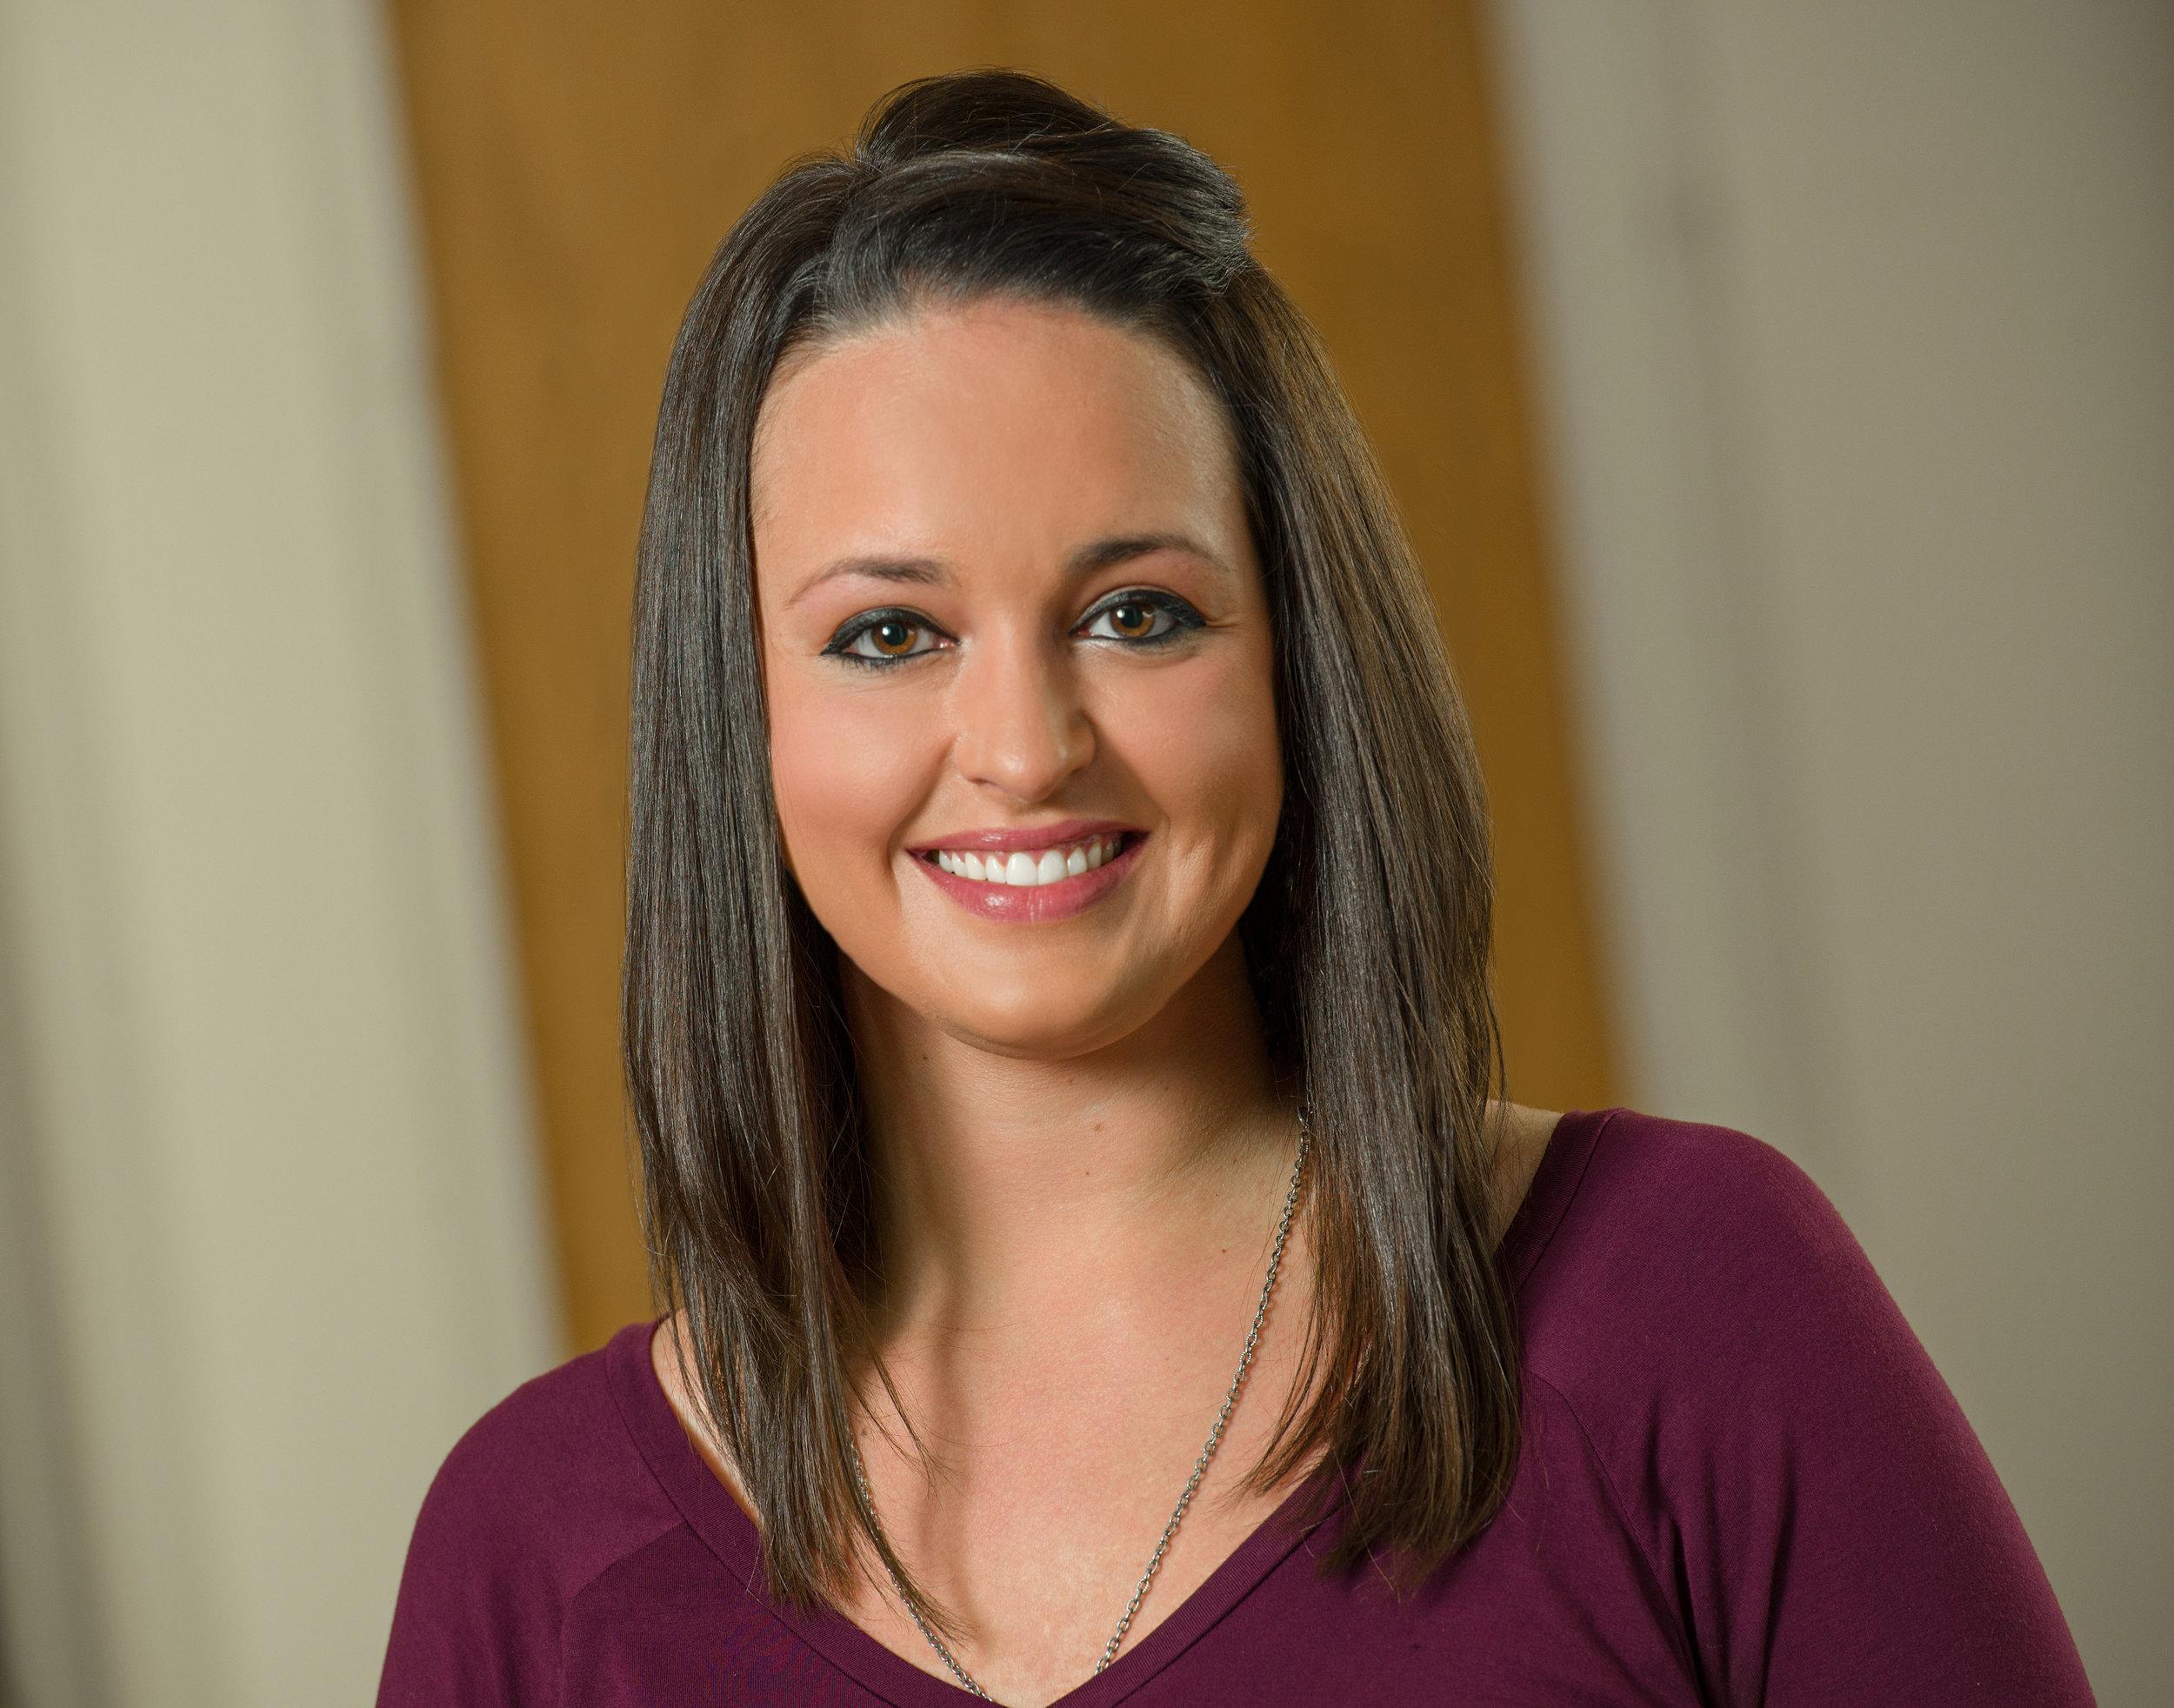 Lattimore Administrative Assistant Jessica Haszlauer